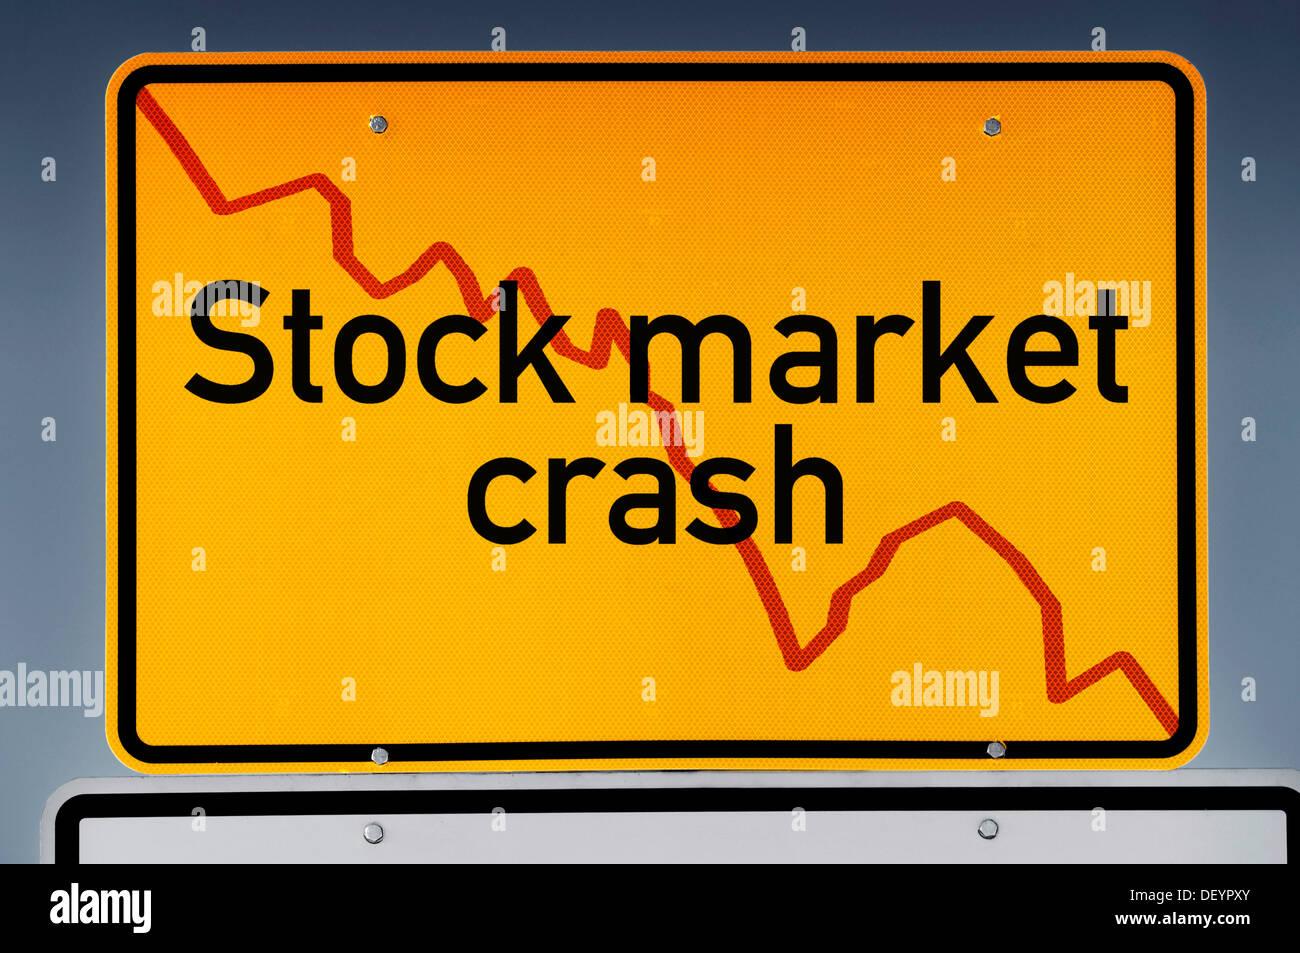 Place-name sign with declining stock chart, lettering 'stock market crash', symbolic image - Stock Image